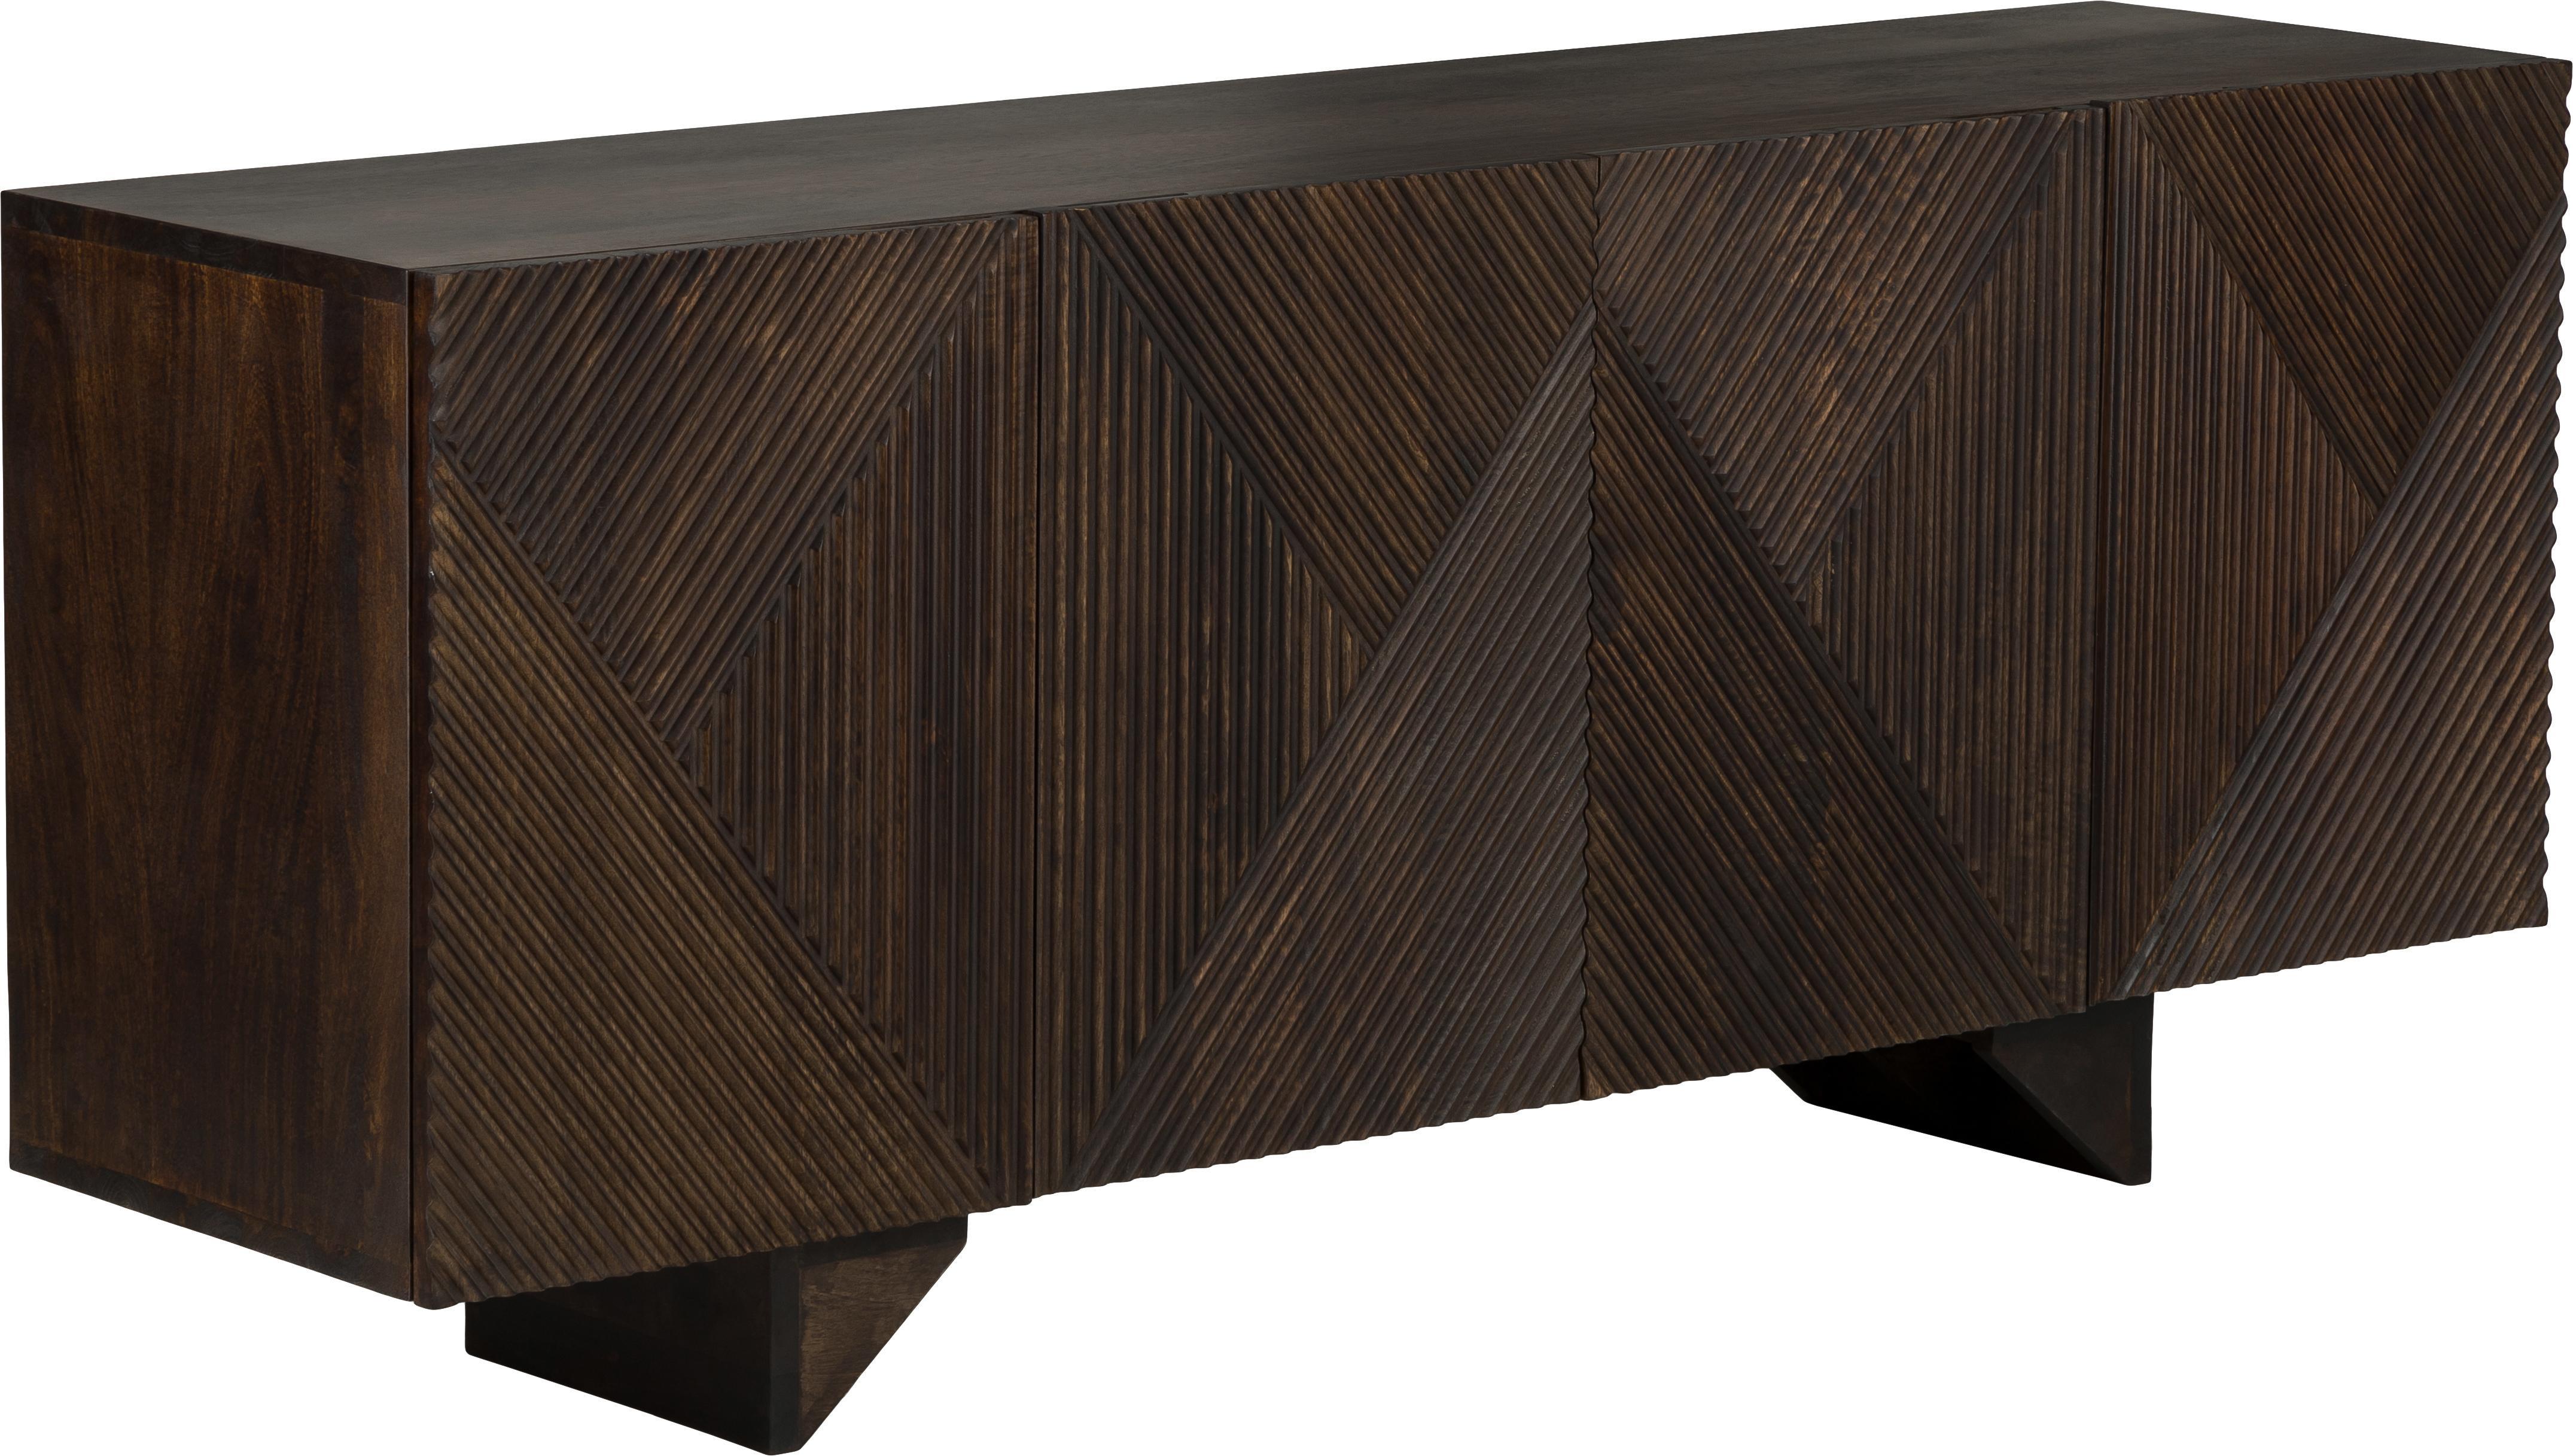 Sideboard Louis aus massiven Mangoholz, Massives Mangoholz, lackiert, Mangoholz, lackiert, 177 x 75 cm